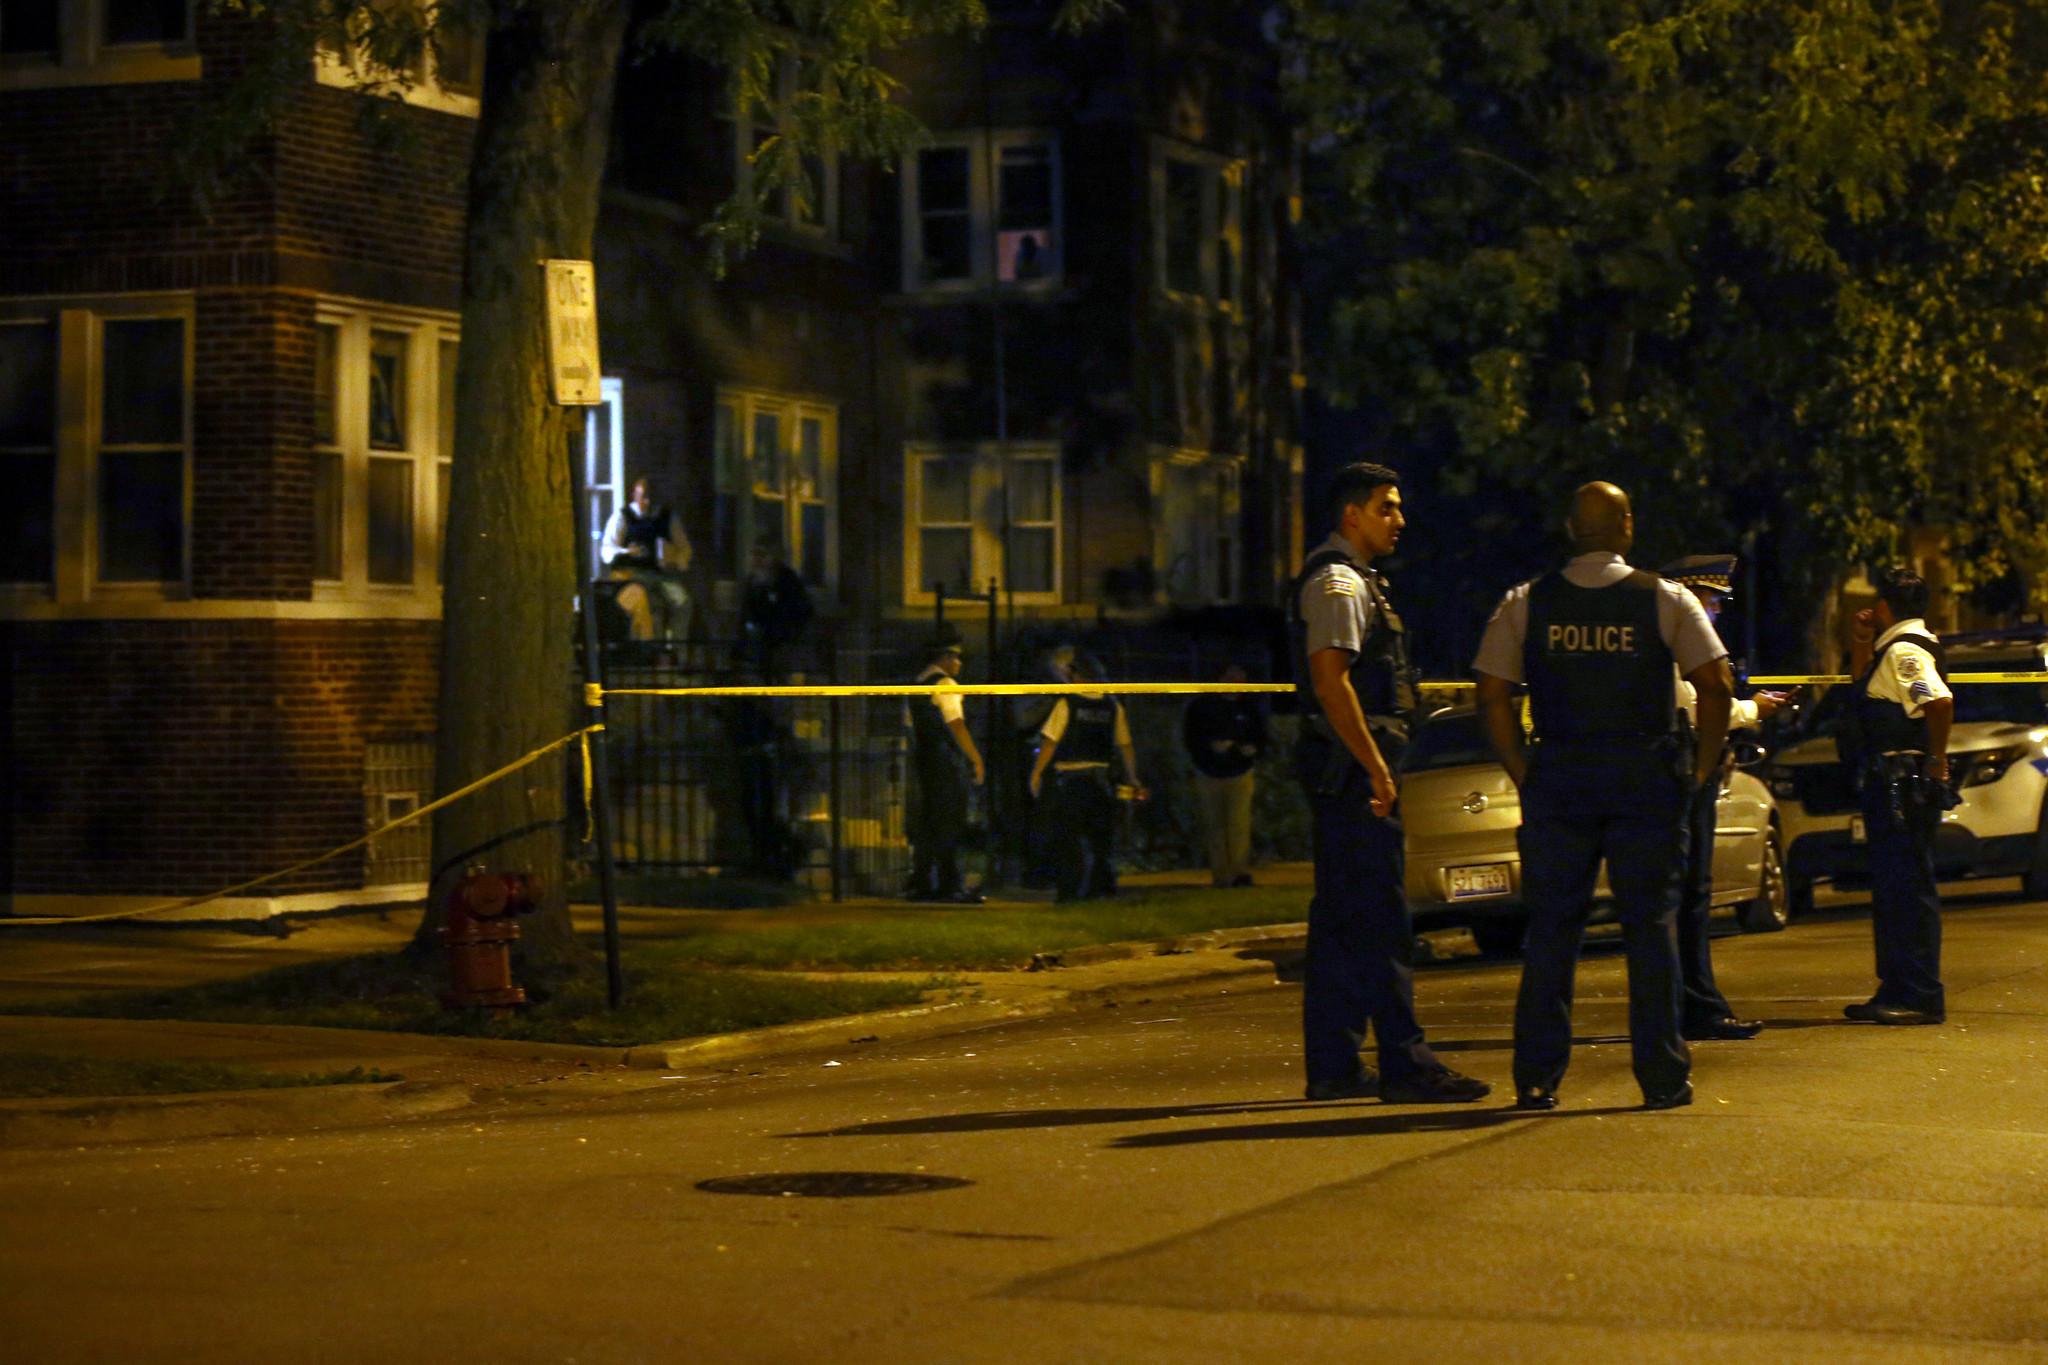 Lawsuit alleges Chicago cop shot unarmed, mentally disturbed man